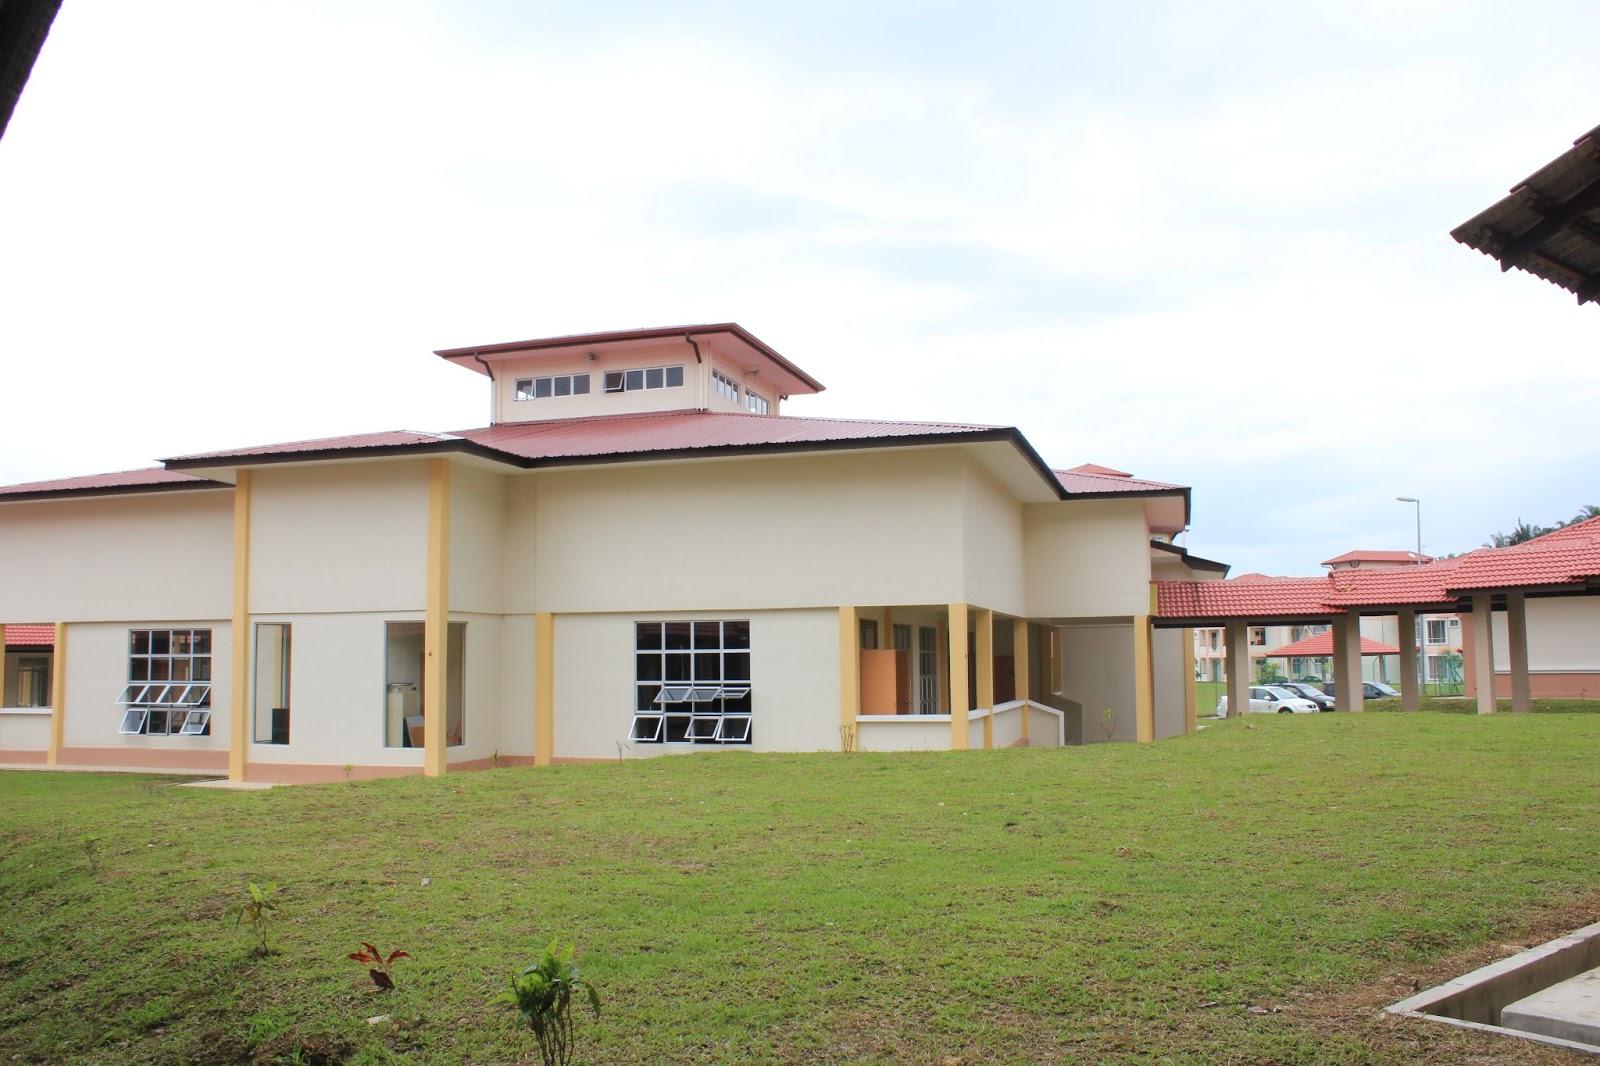 Sekolah Menengah Agama Persekutuan Bentong Kronis G